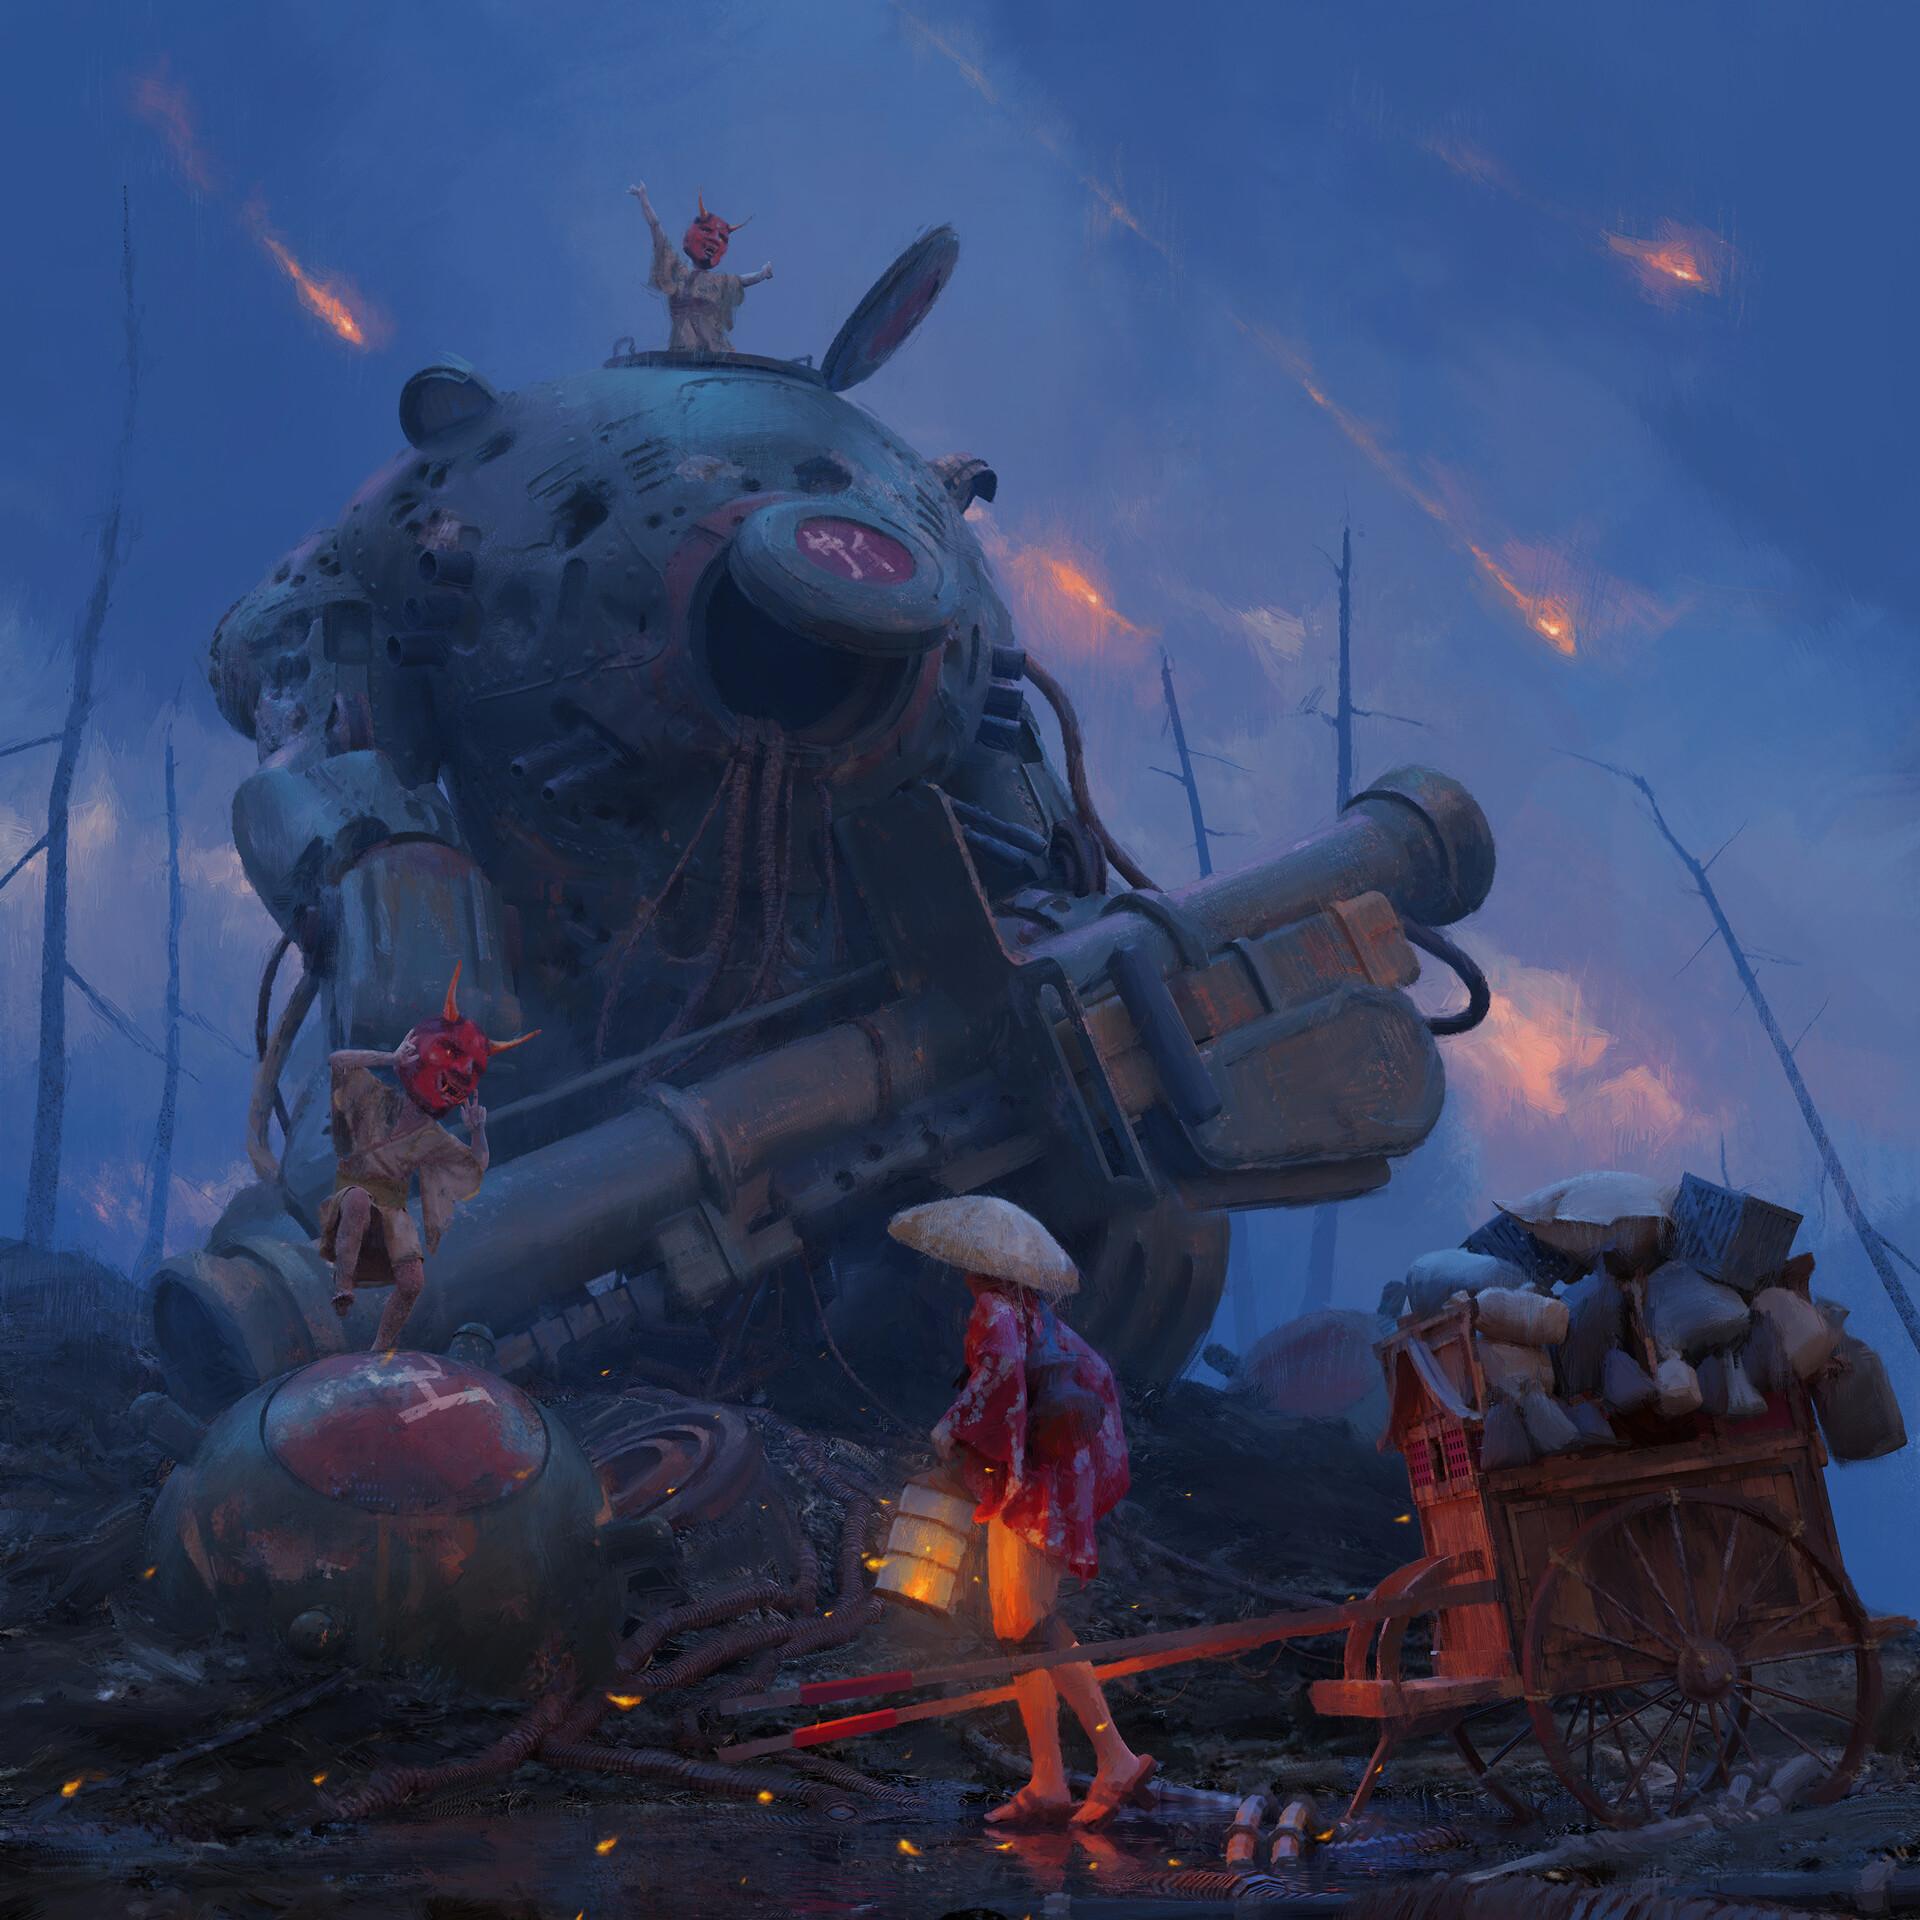 General 1920x1920 mech demon mask weapon horns eastern wires debris cannons lantern children women fire